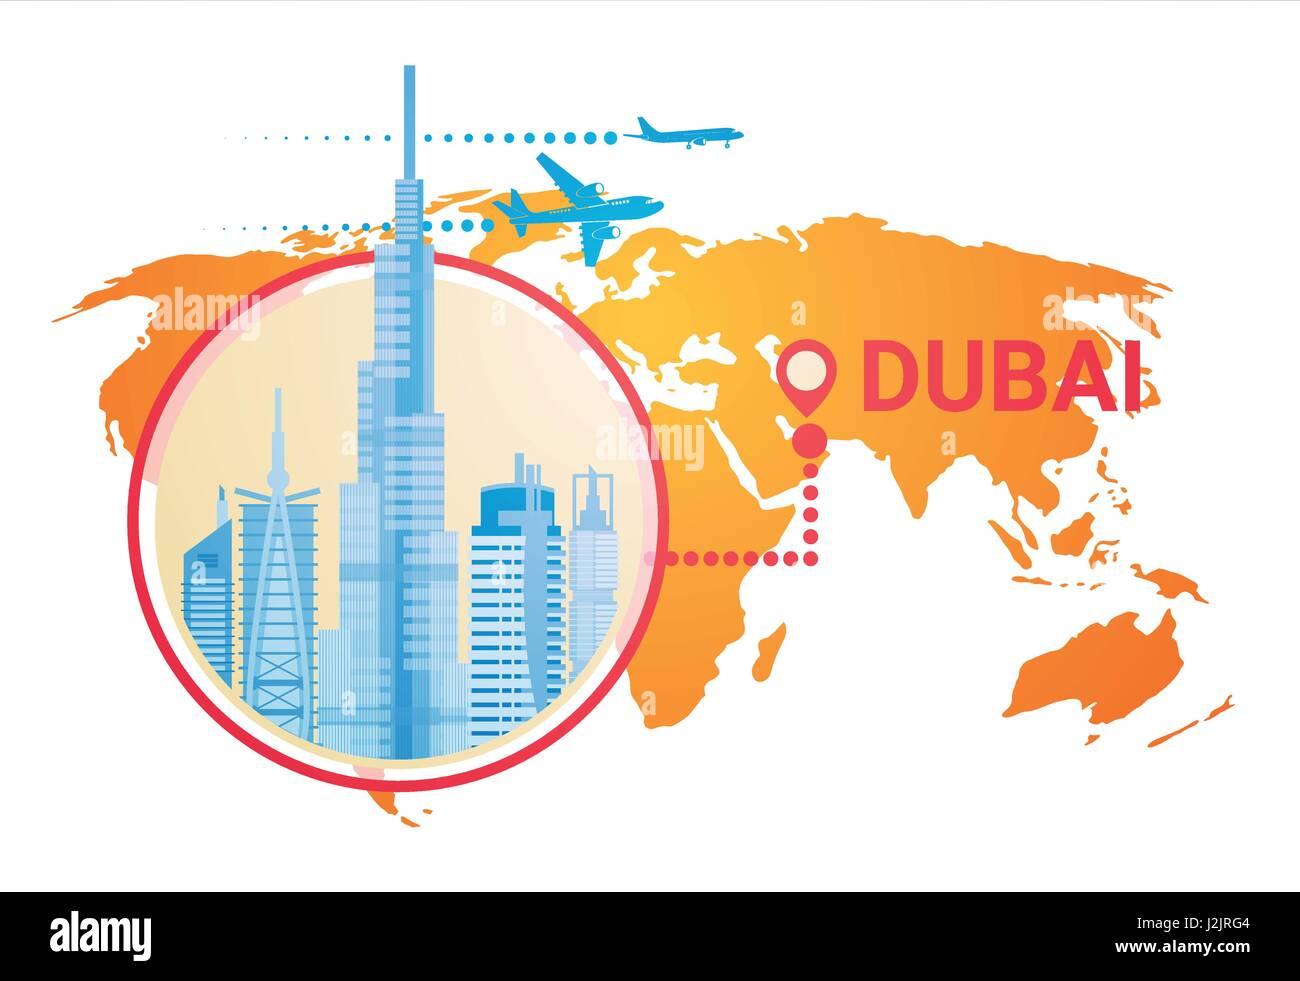 Dubai Skyline Panorama Over World Map Modern Building Cityscape